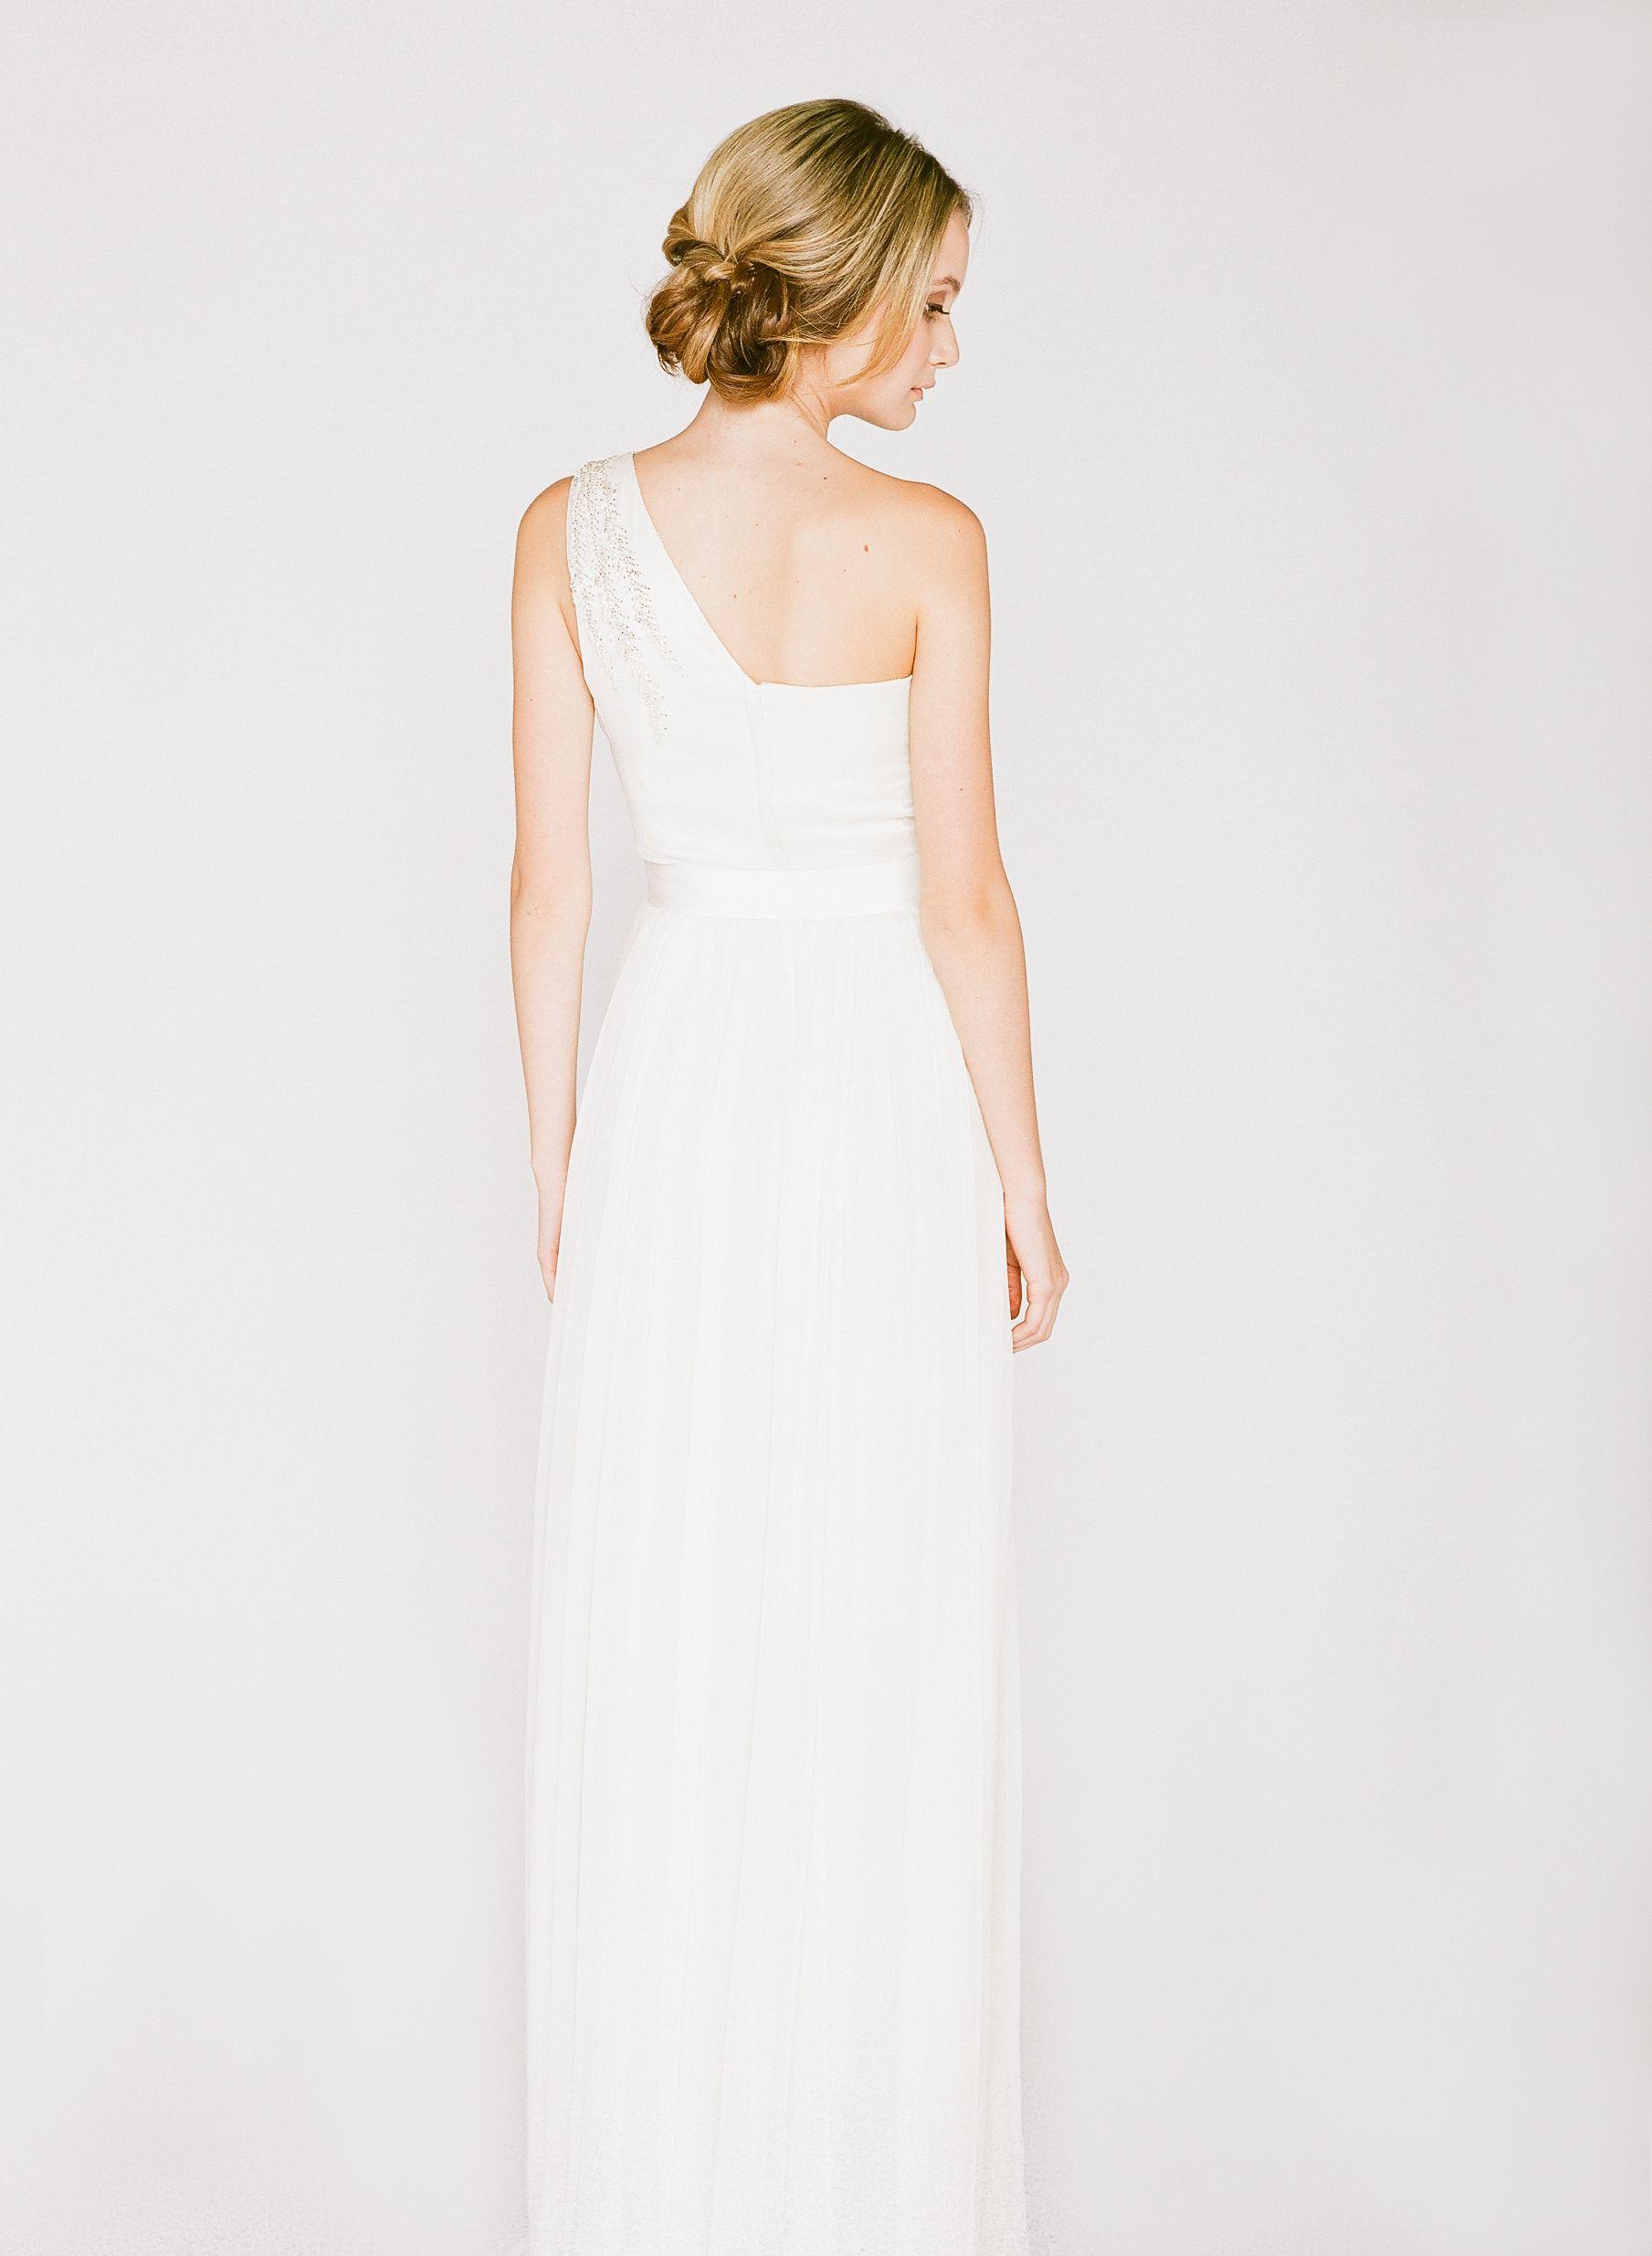 Rc wedding dress and weddings